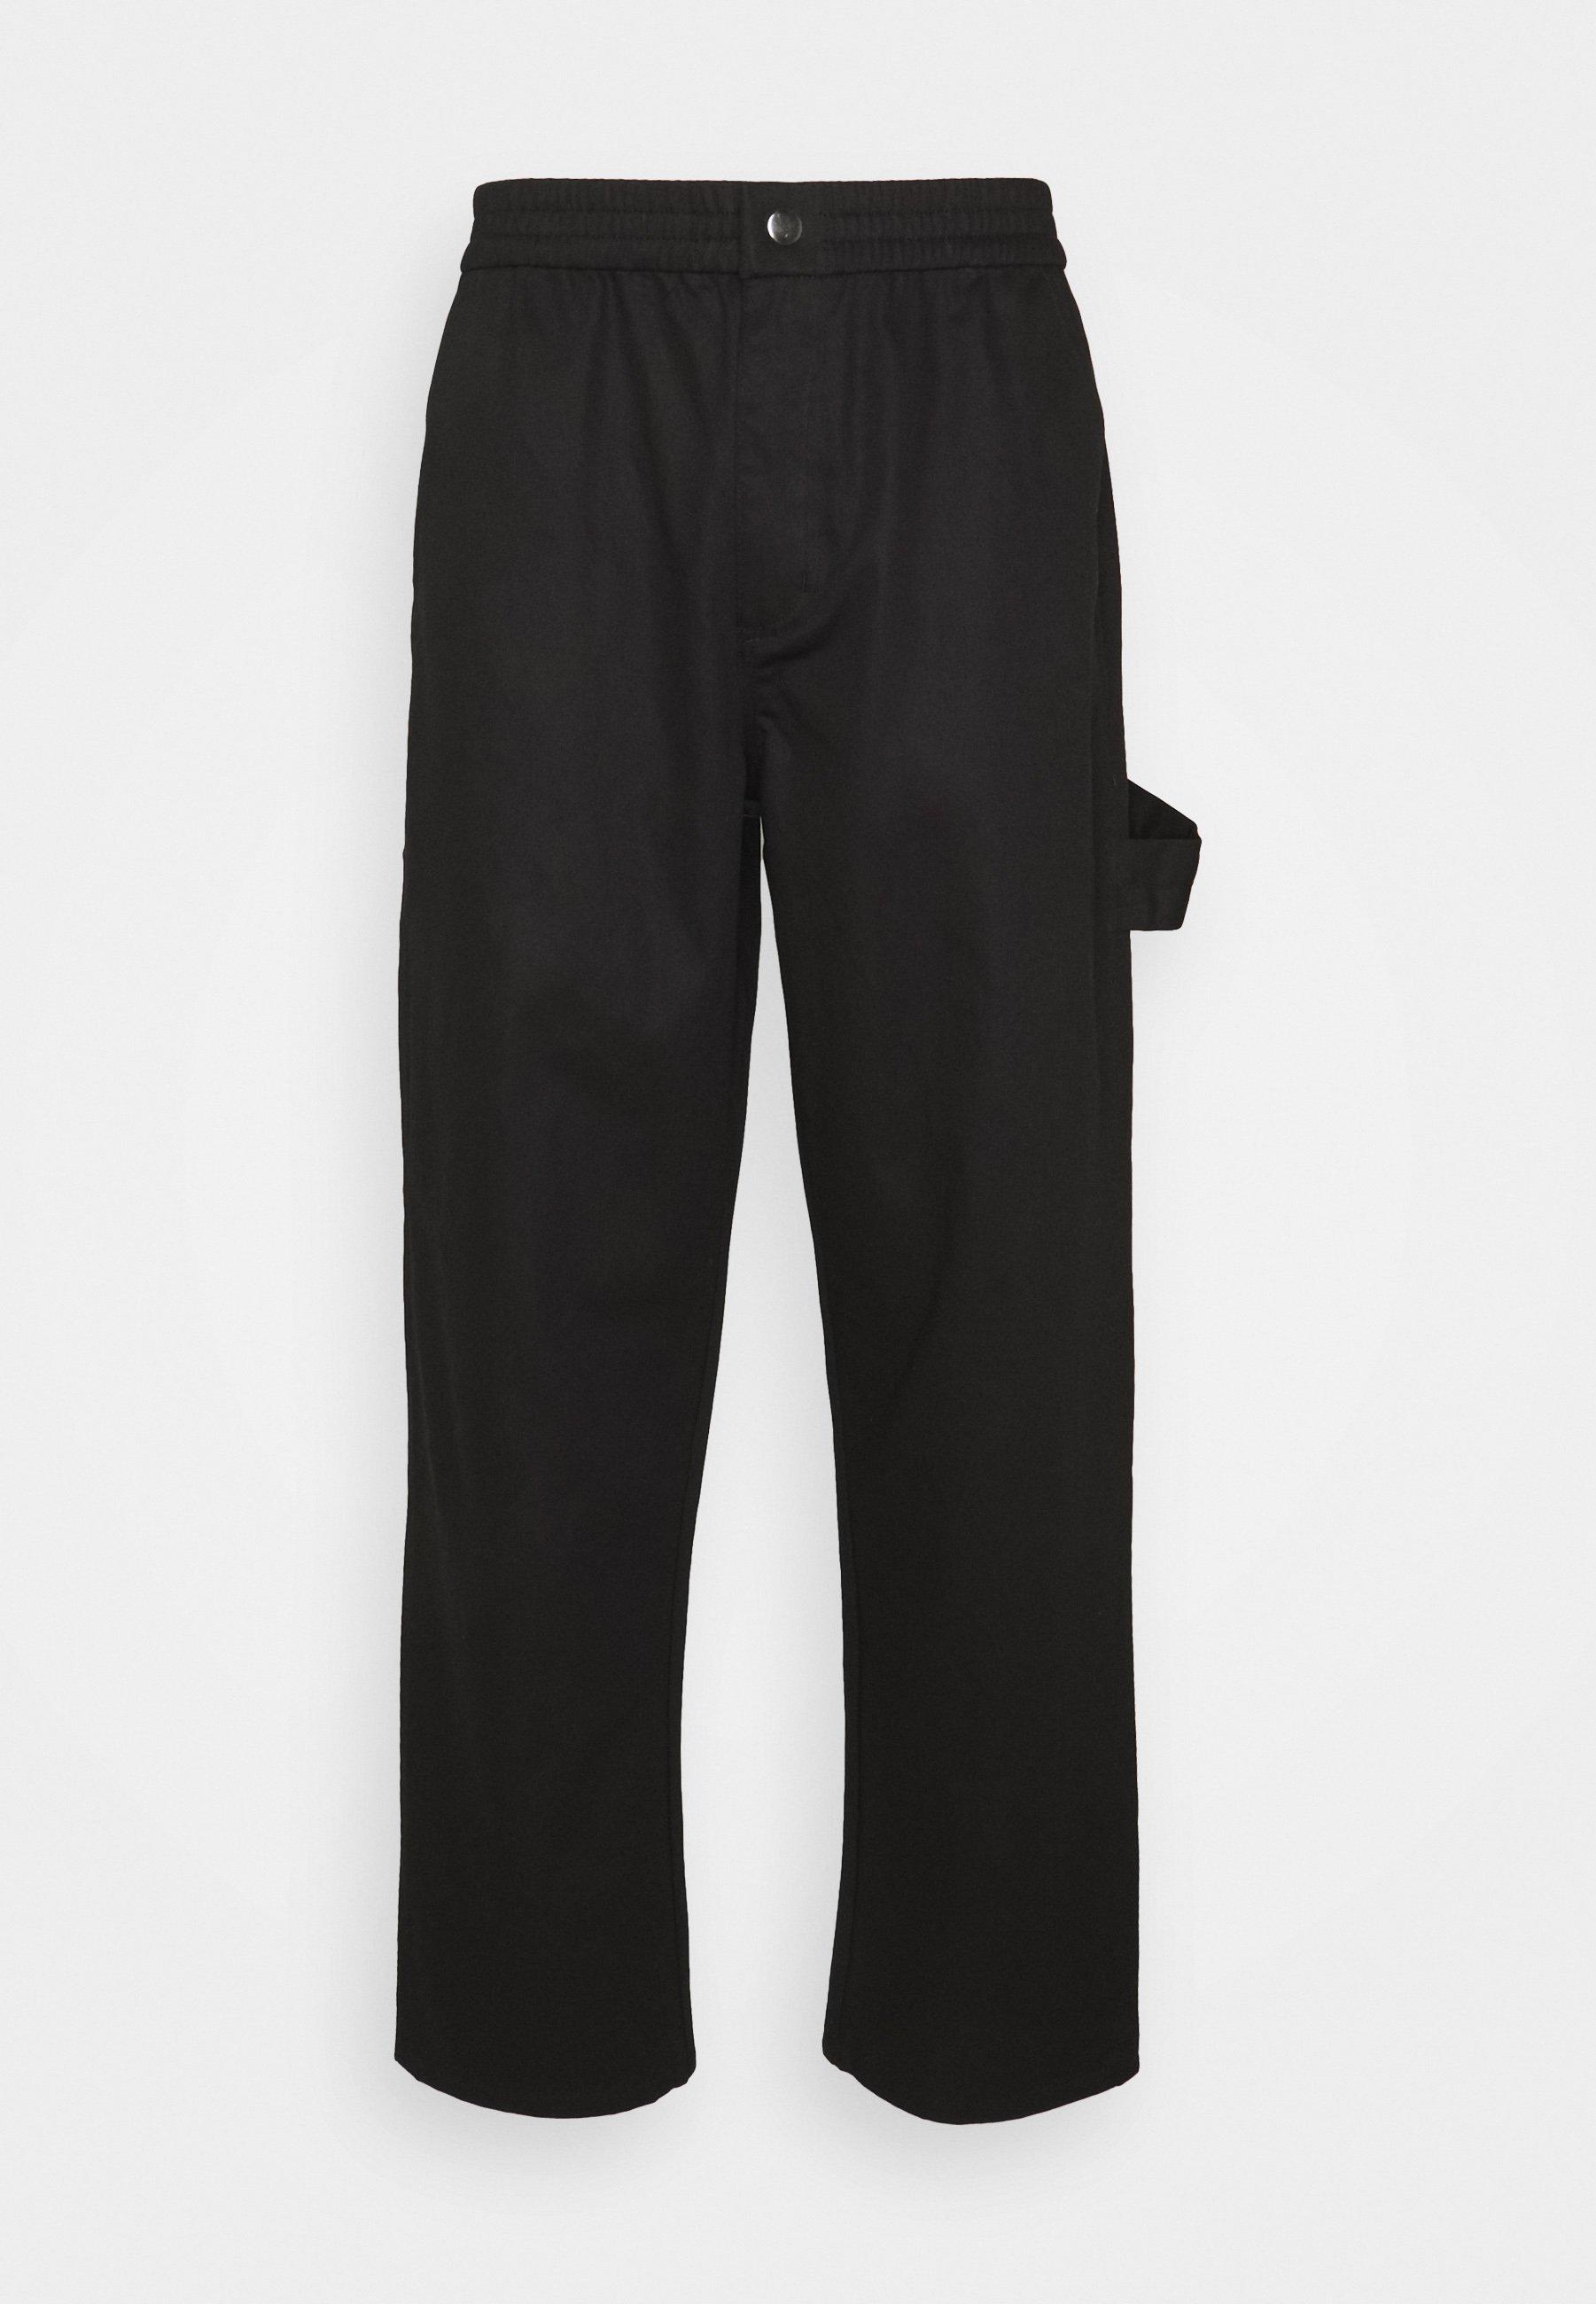 Men ROMEOVILLE TROUSERS UNISEX - Cargo trousers